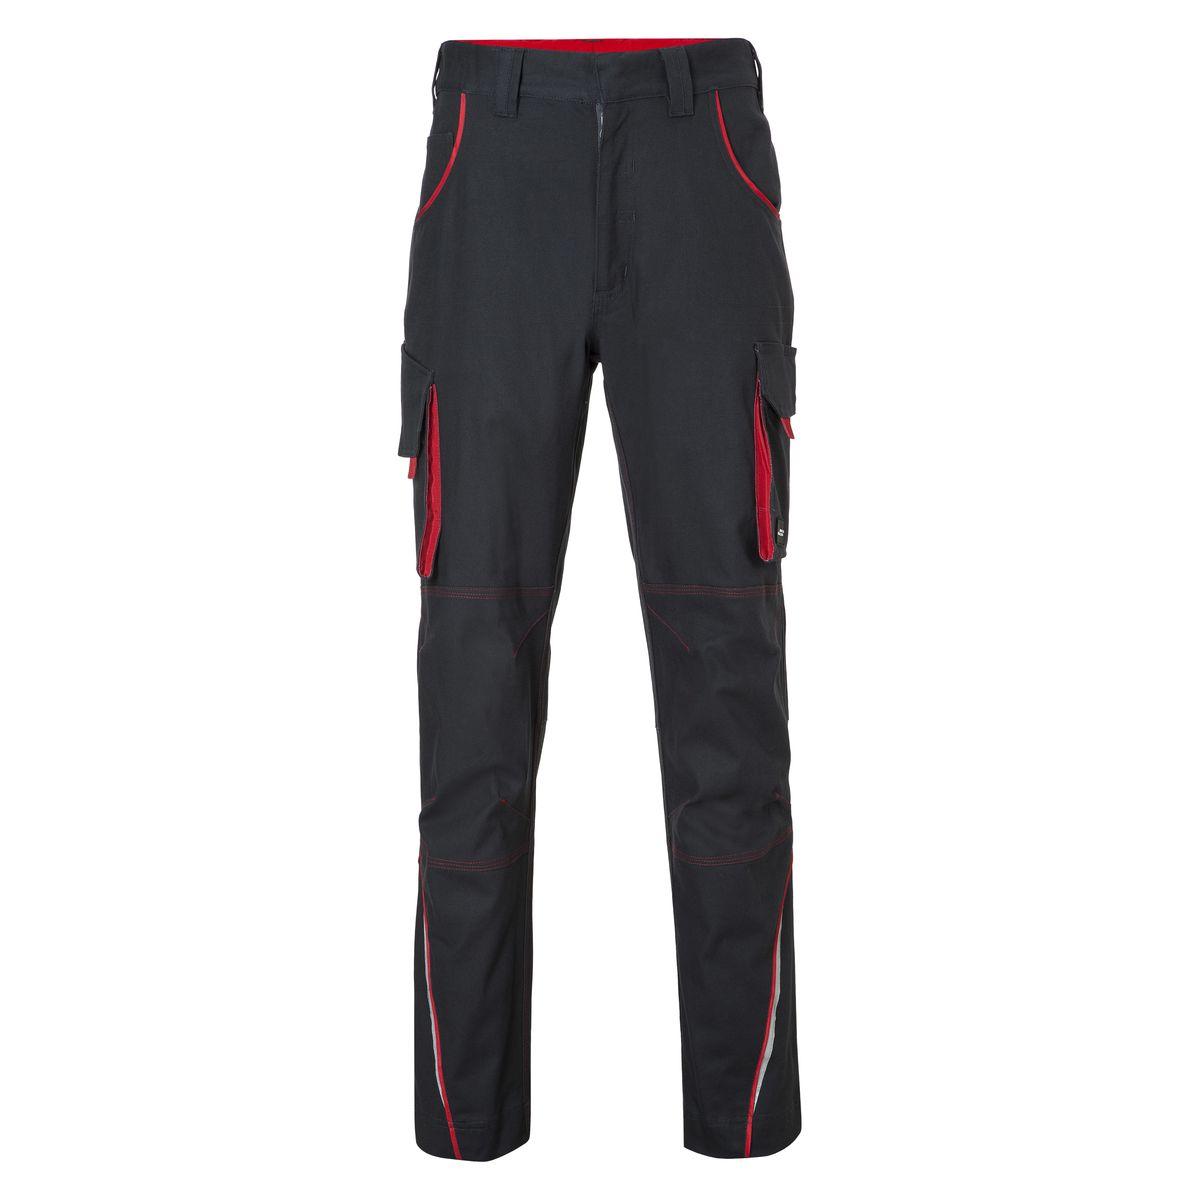 Breve lavoro Pantaloni Bermuda Workwear Pantaloni James /& Nicholson Pantaloni Federale arbeitskleidu